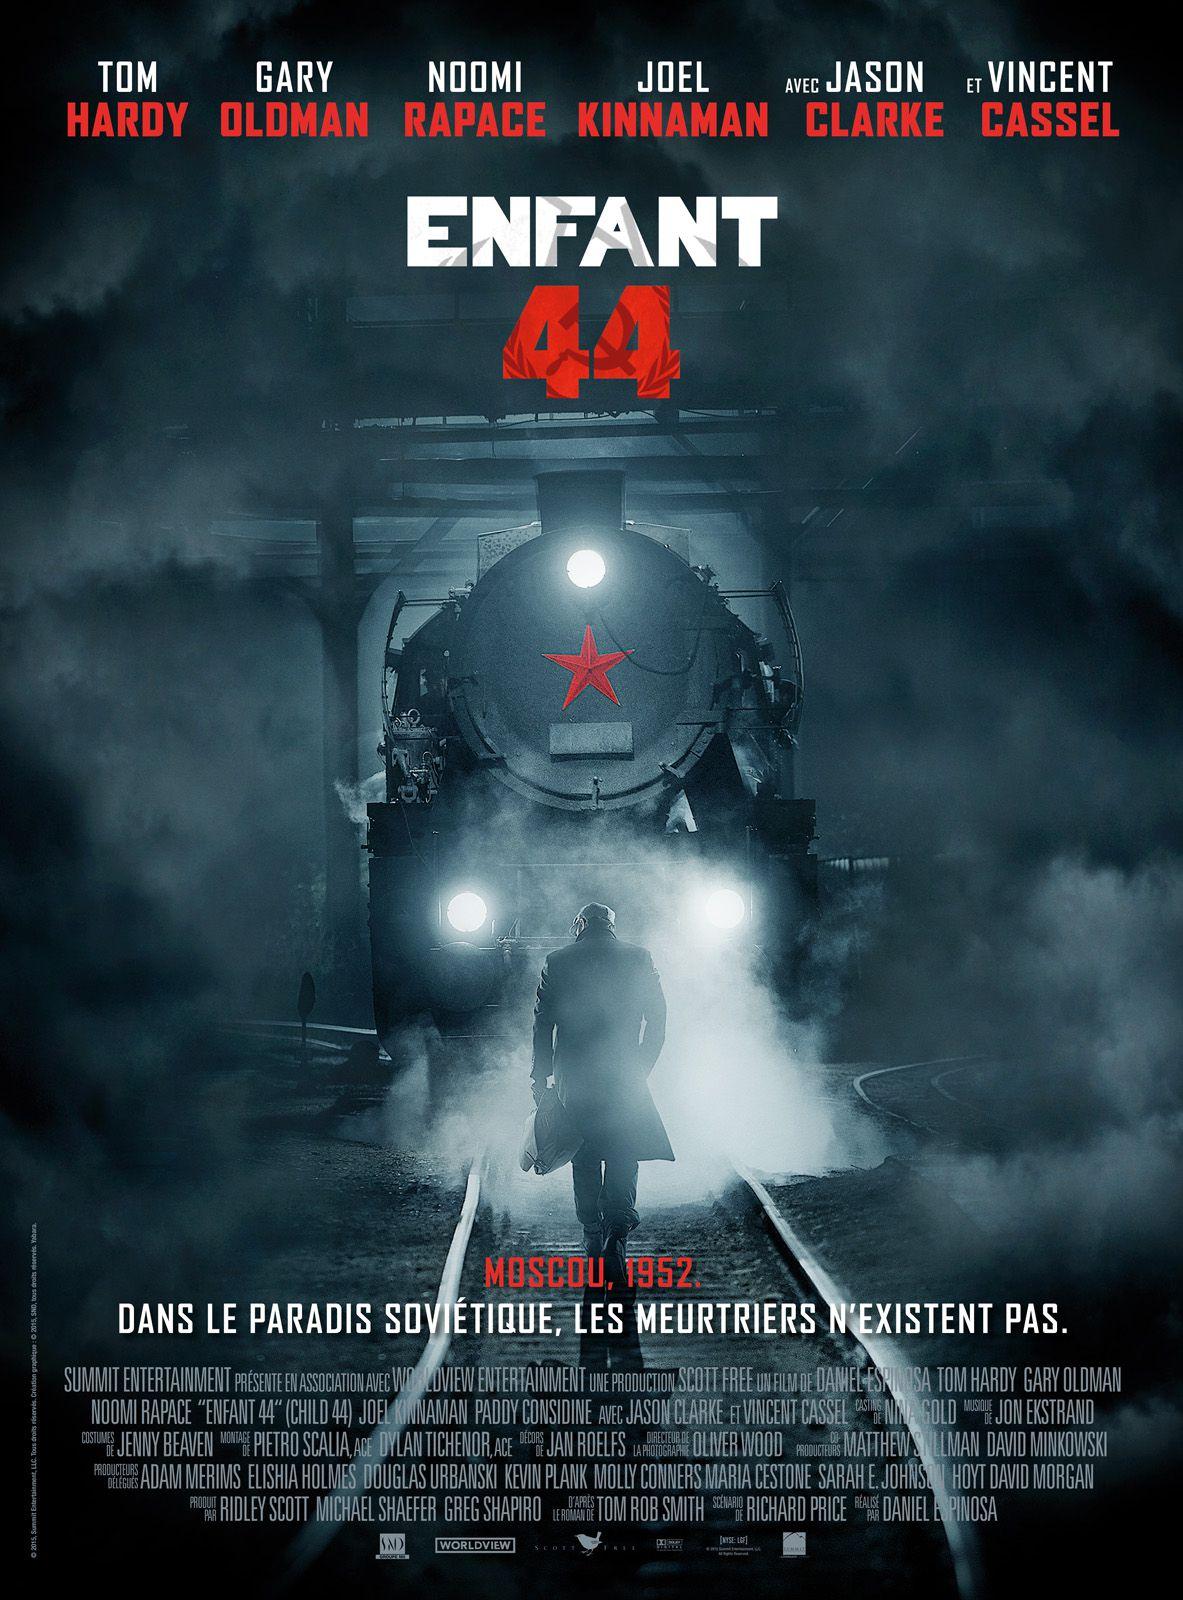 Enfant 44 - Film (2015)